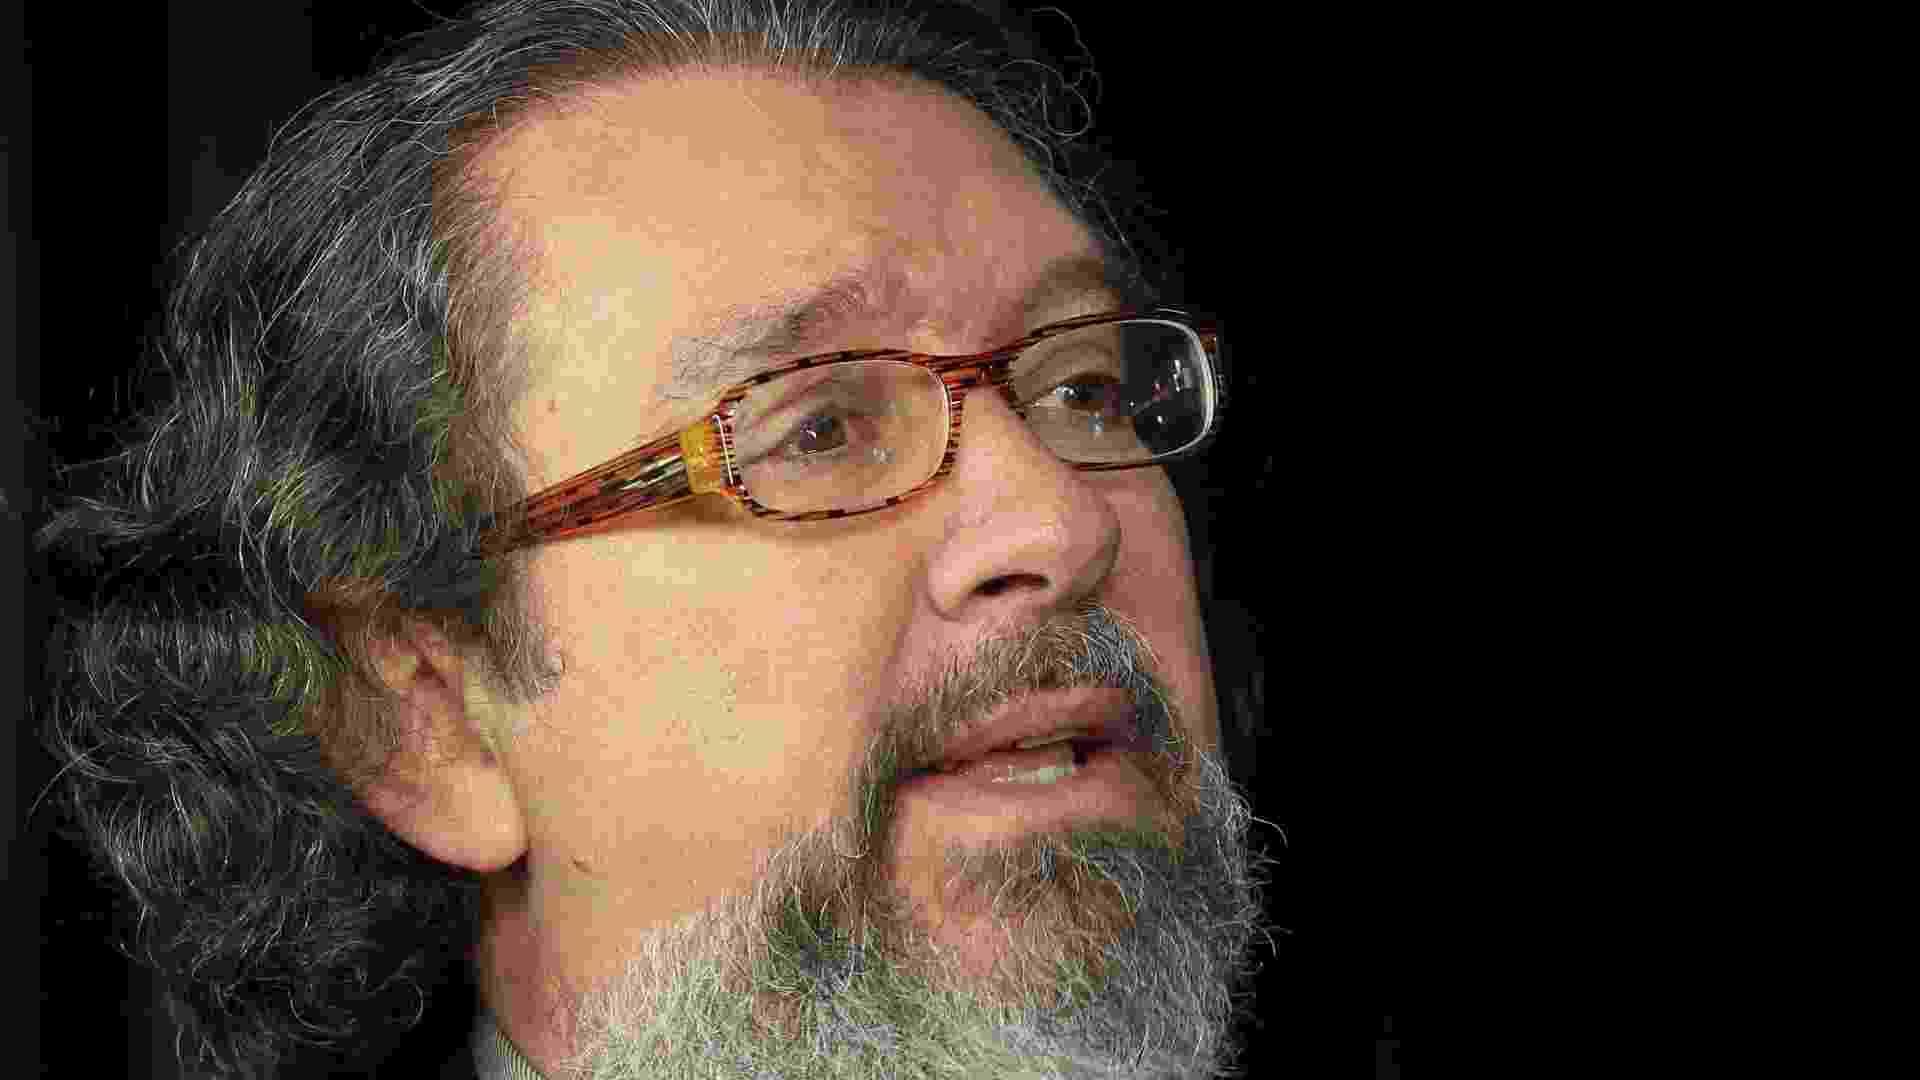 Kakay no Poder e Política - Lula Marques 10.jul.2012/Folhapress